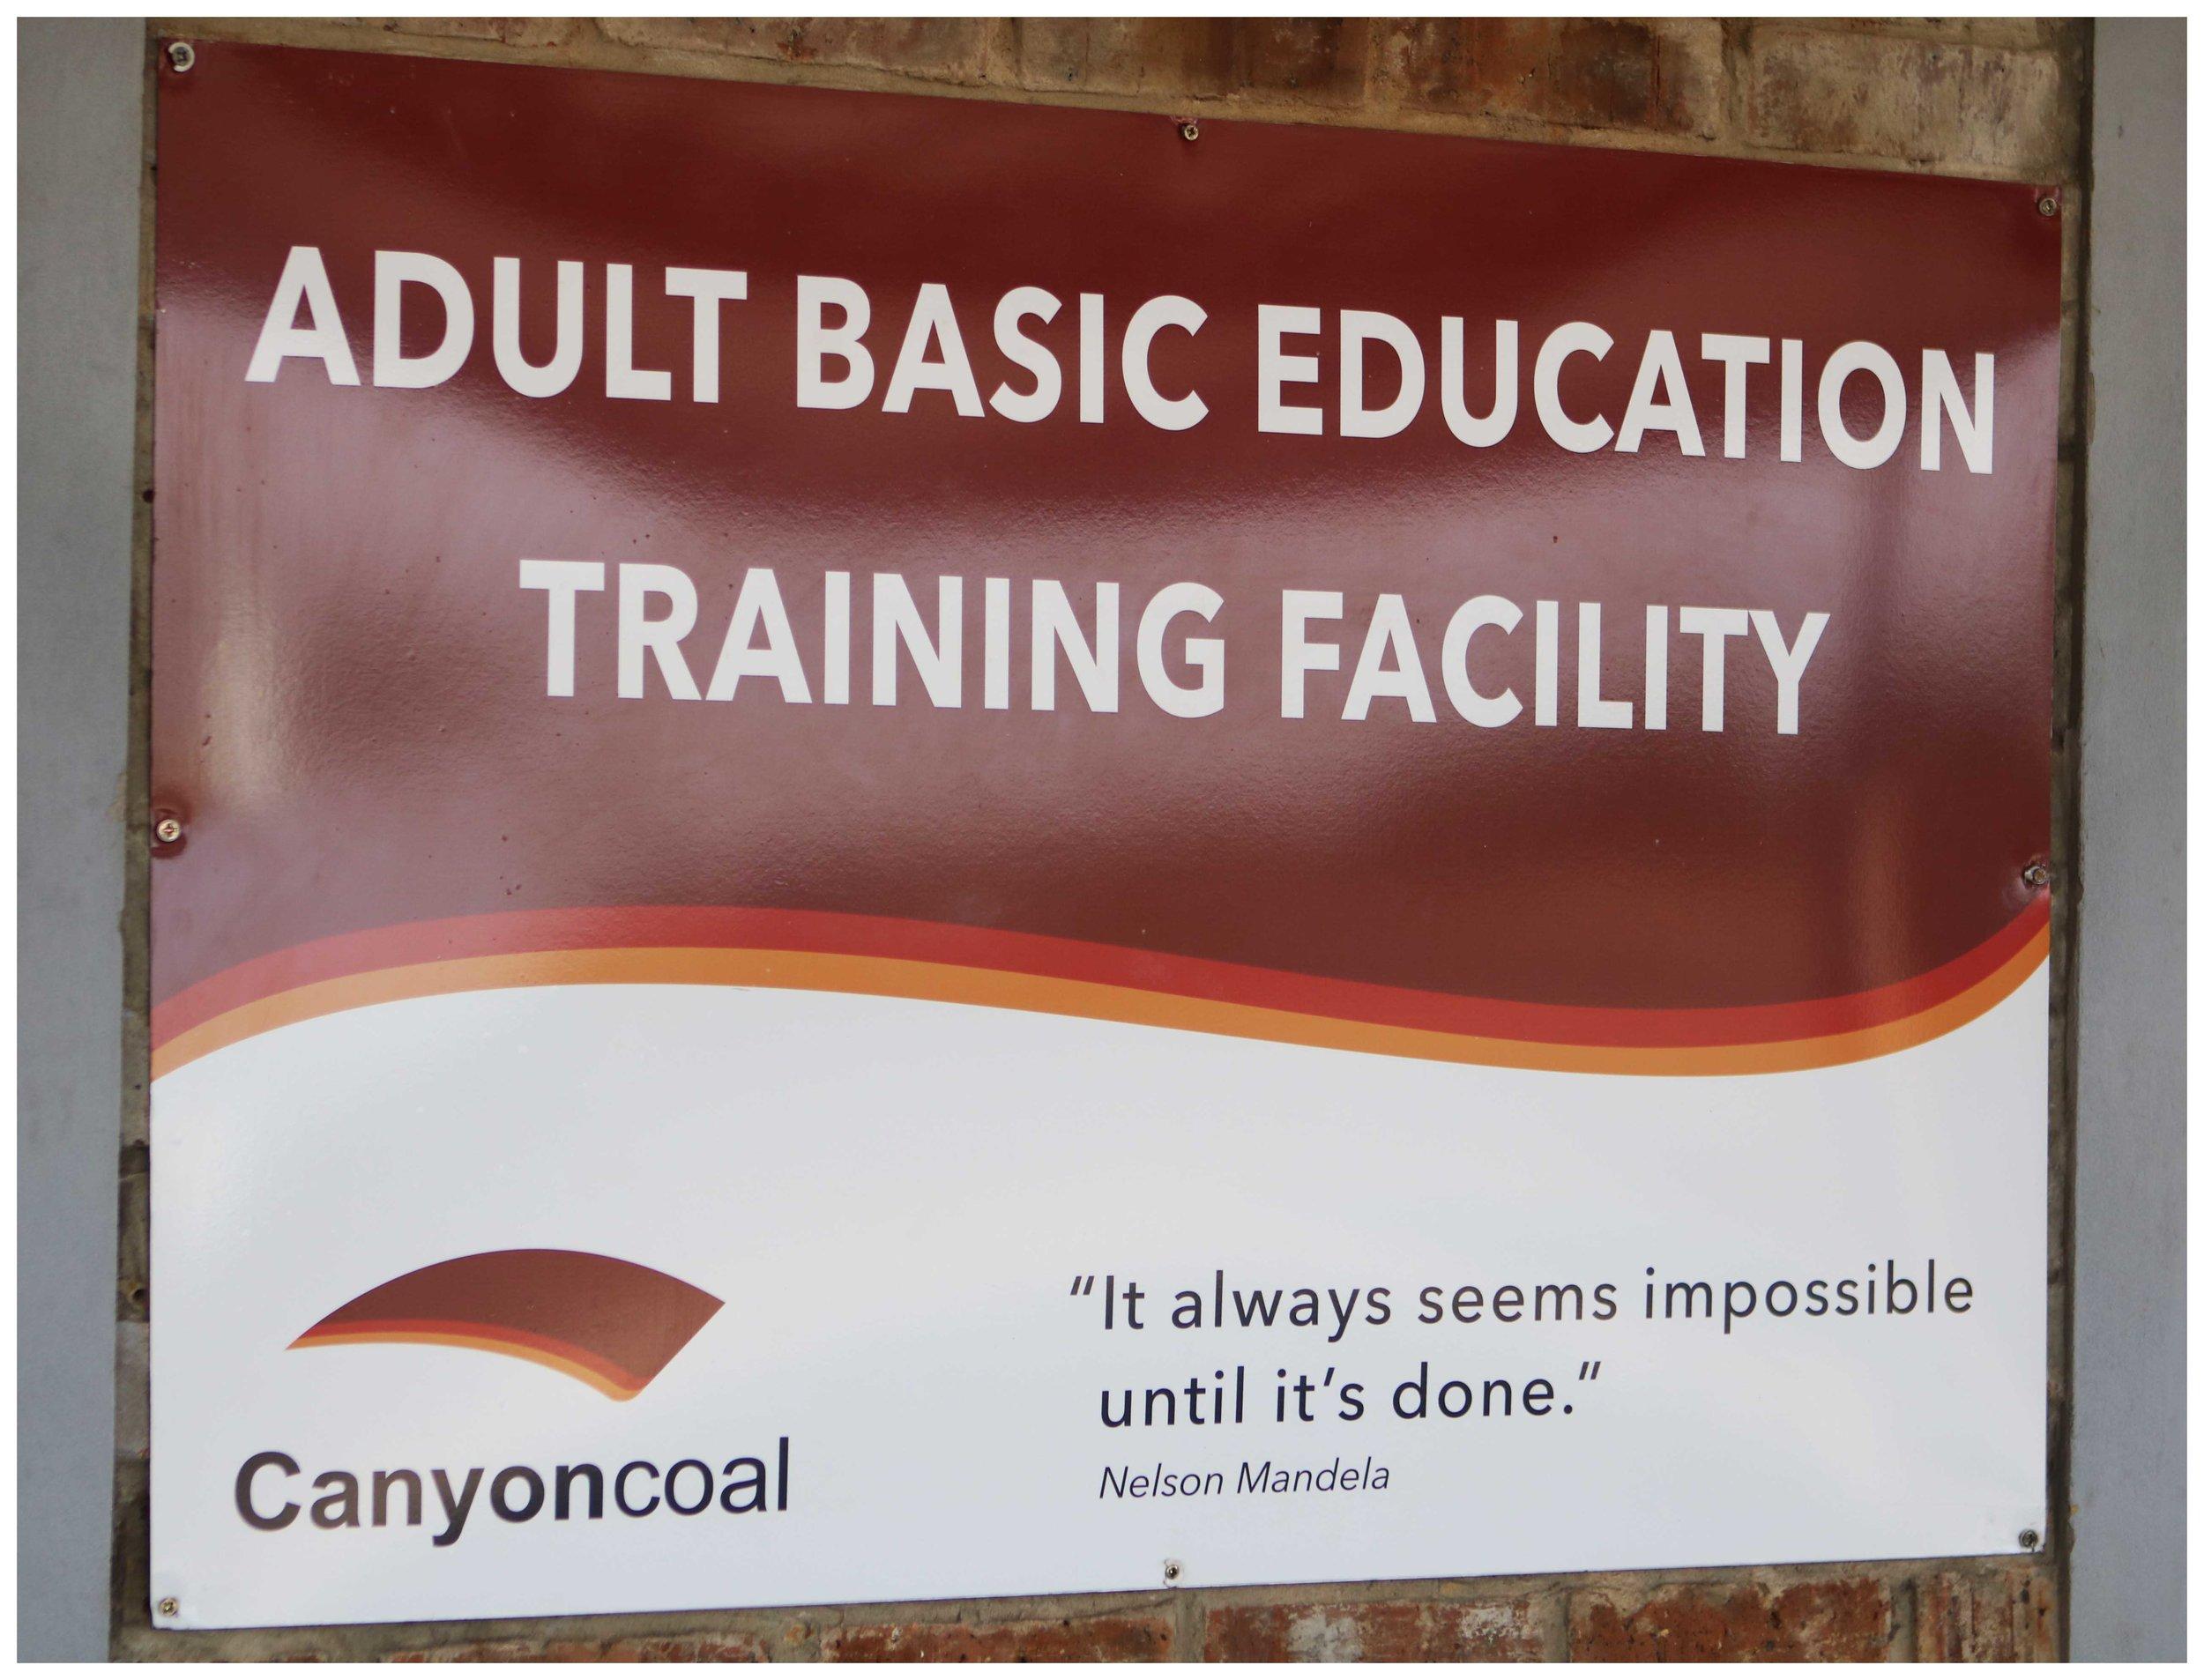 CNY_Images_AdultBasicEducationTraingCentre_Signage.jpg